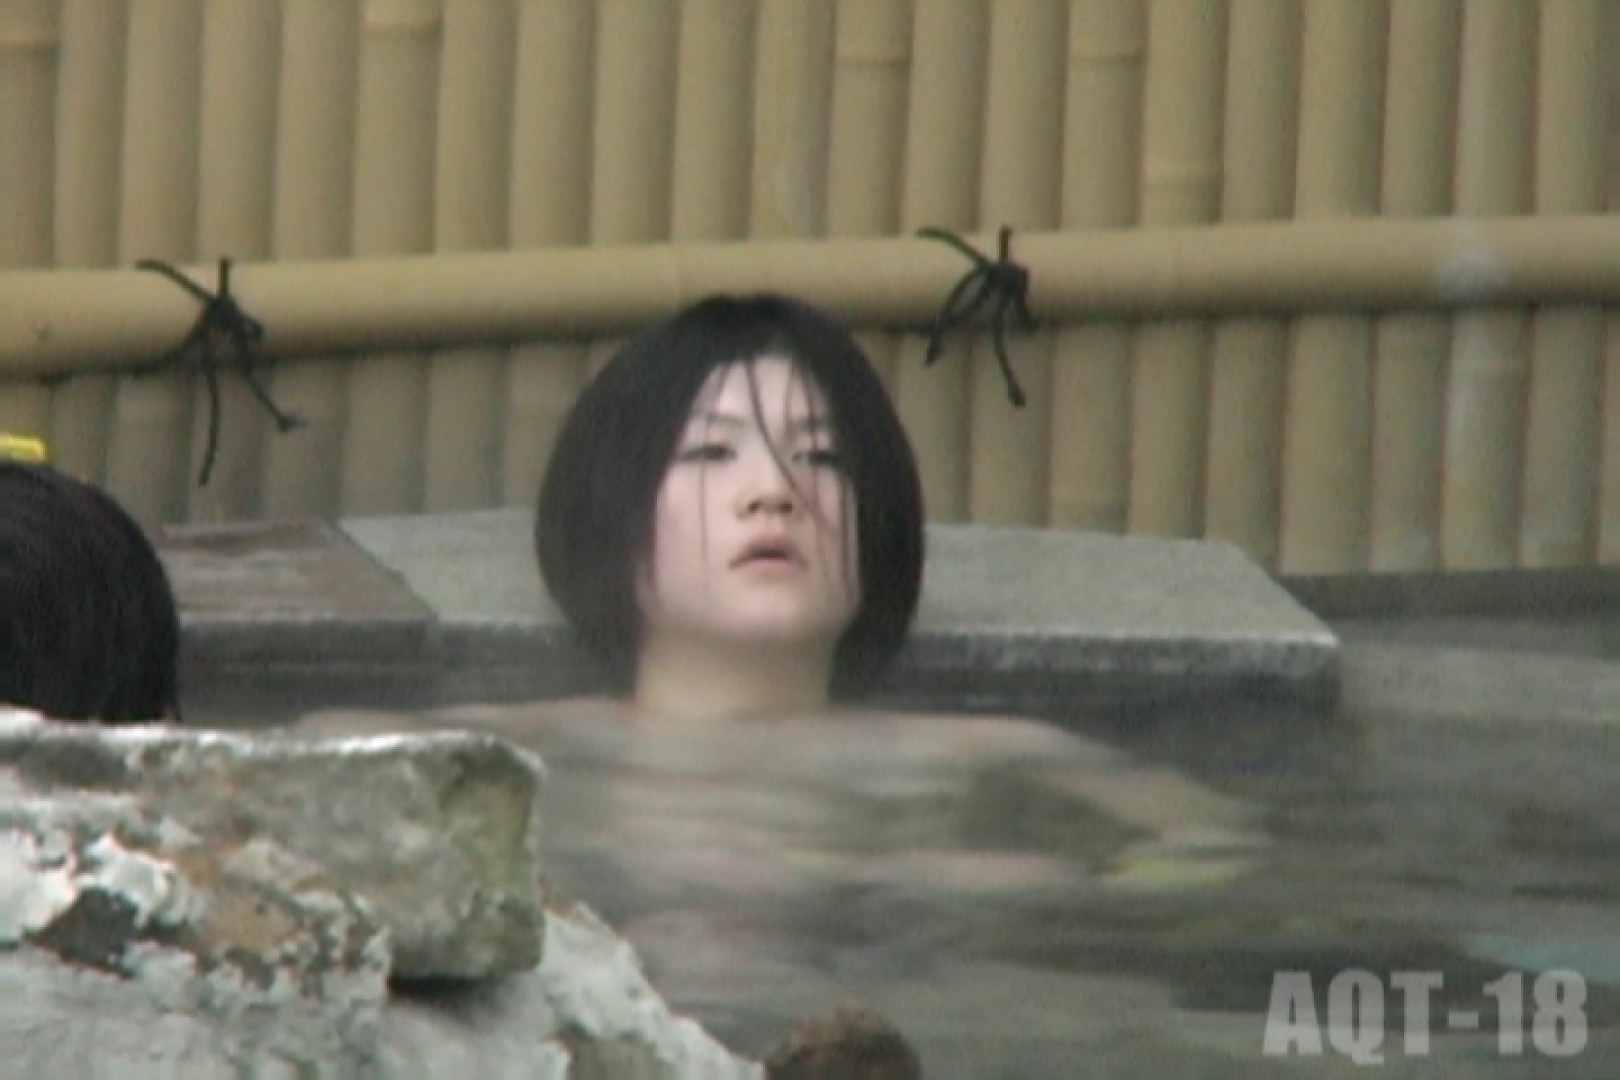 Aquaな露天風呂Vol.859 盗撮 戯れ無修正画像 76連発 11